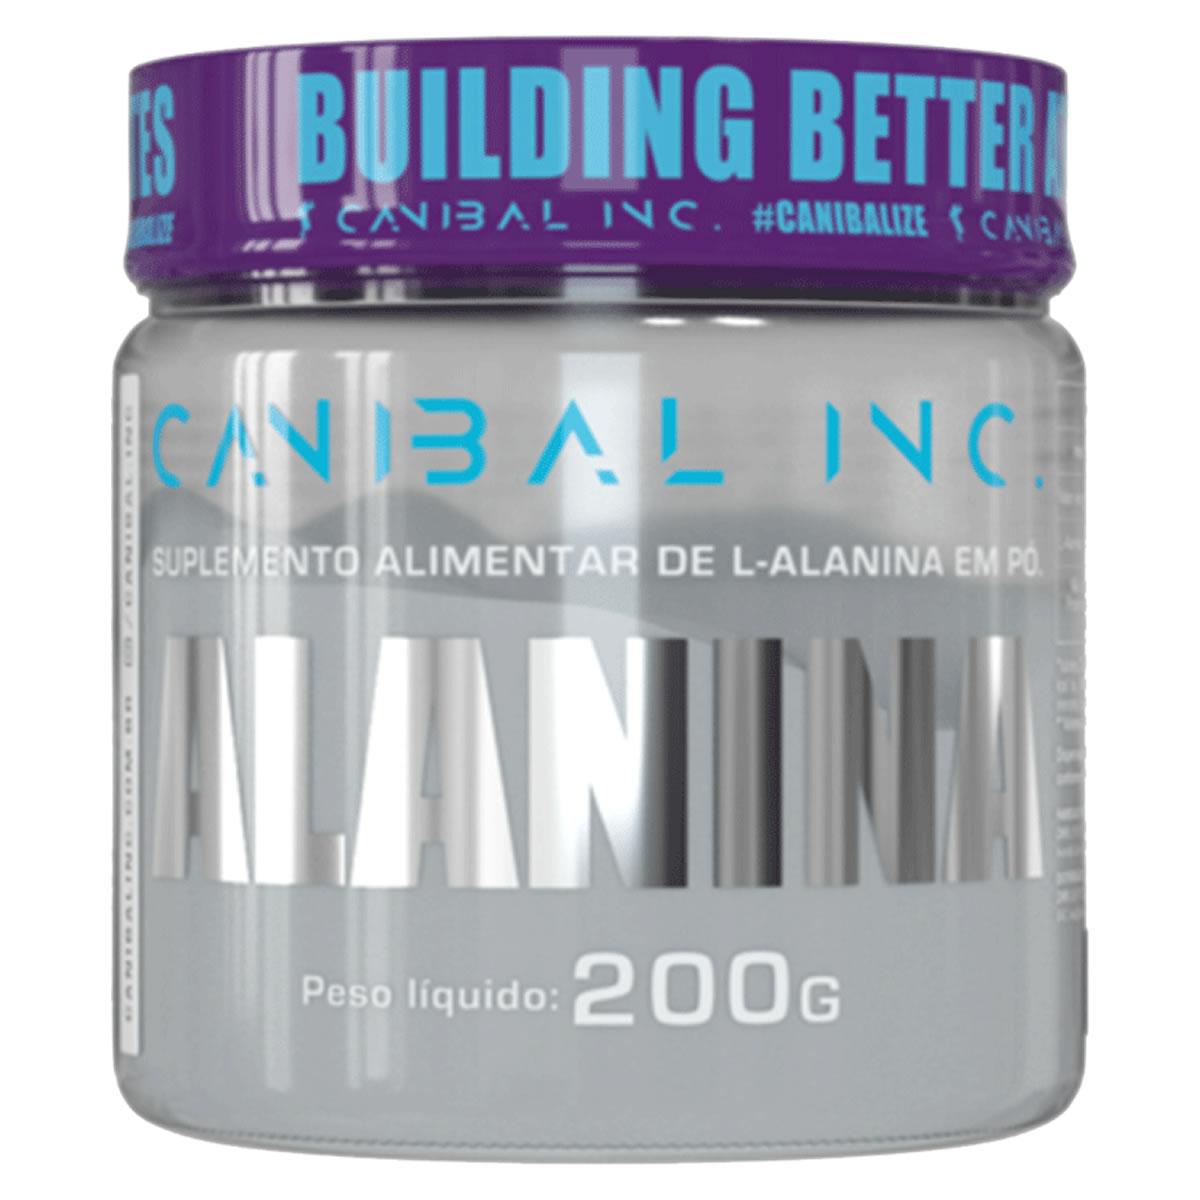 Alanina 200g - CANIBAL INC